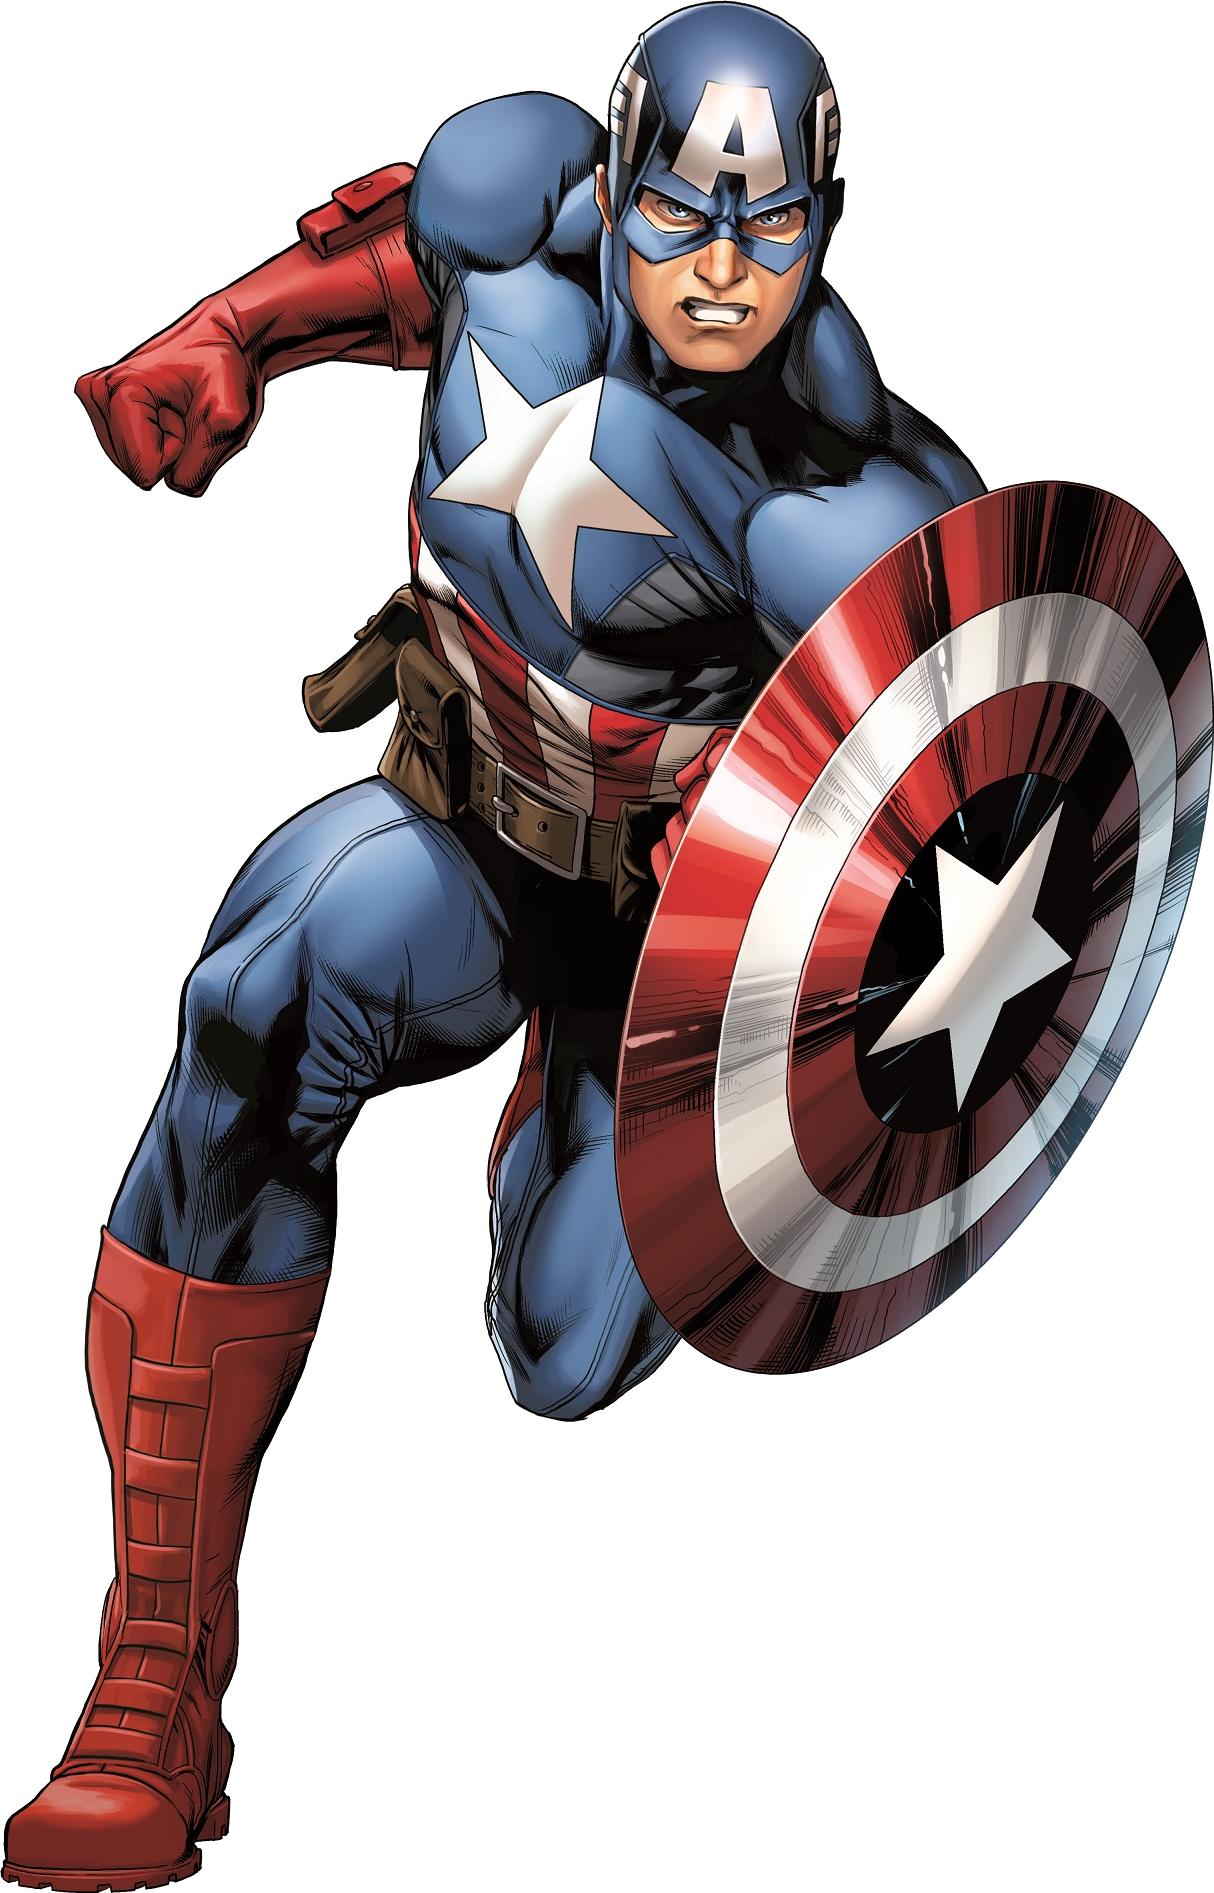 Captain america png image purepng free transparent cc0 png image library - Image captain america ...